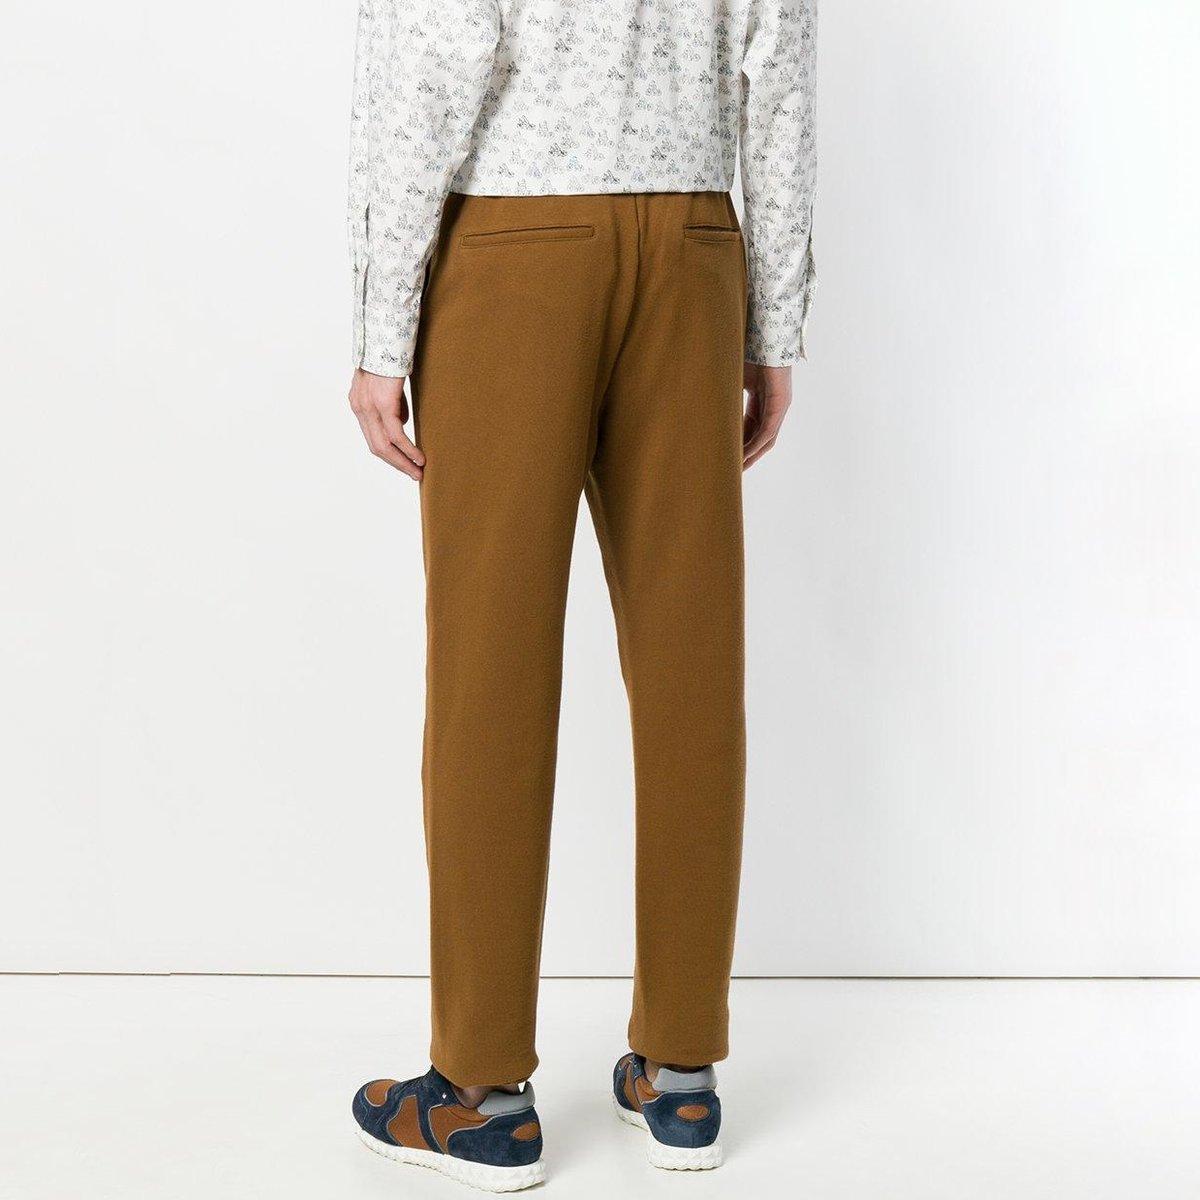 marni-Brown-Tailored-Track-Pants (1).jpg